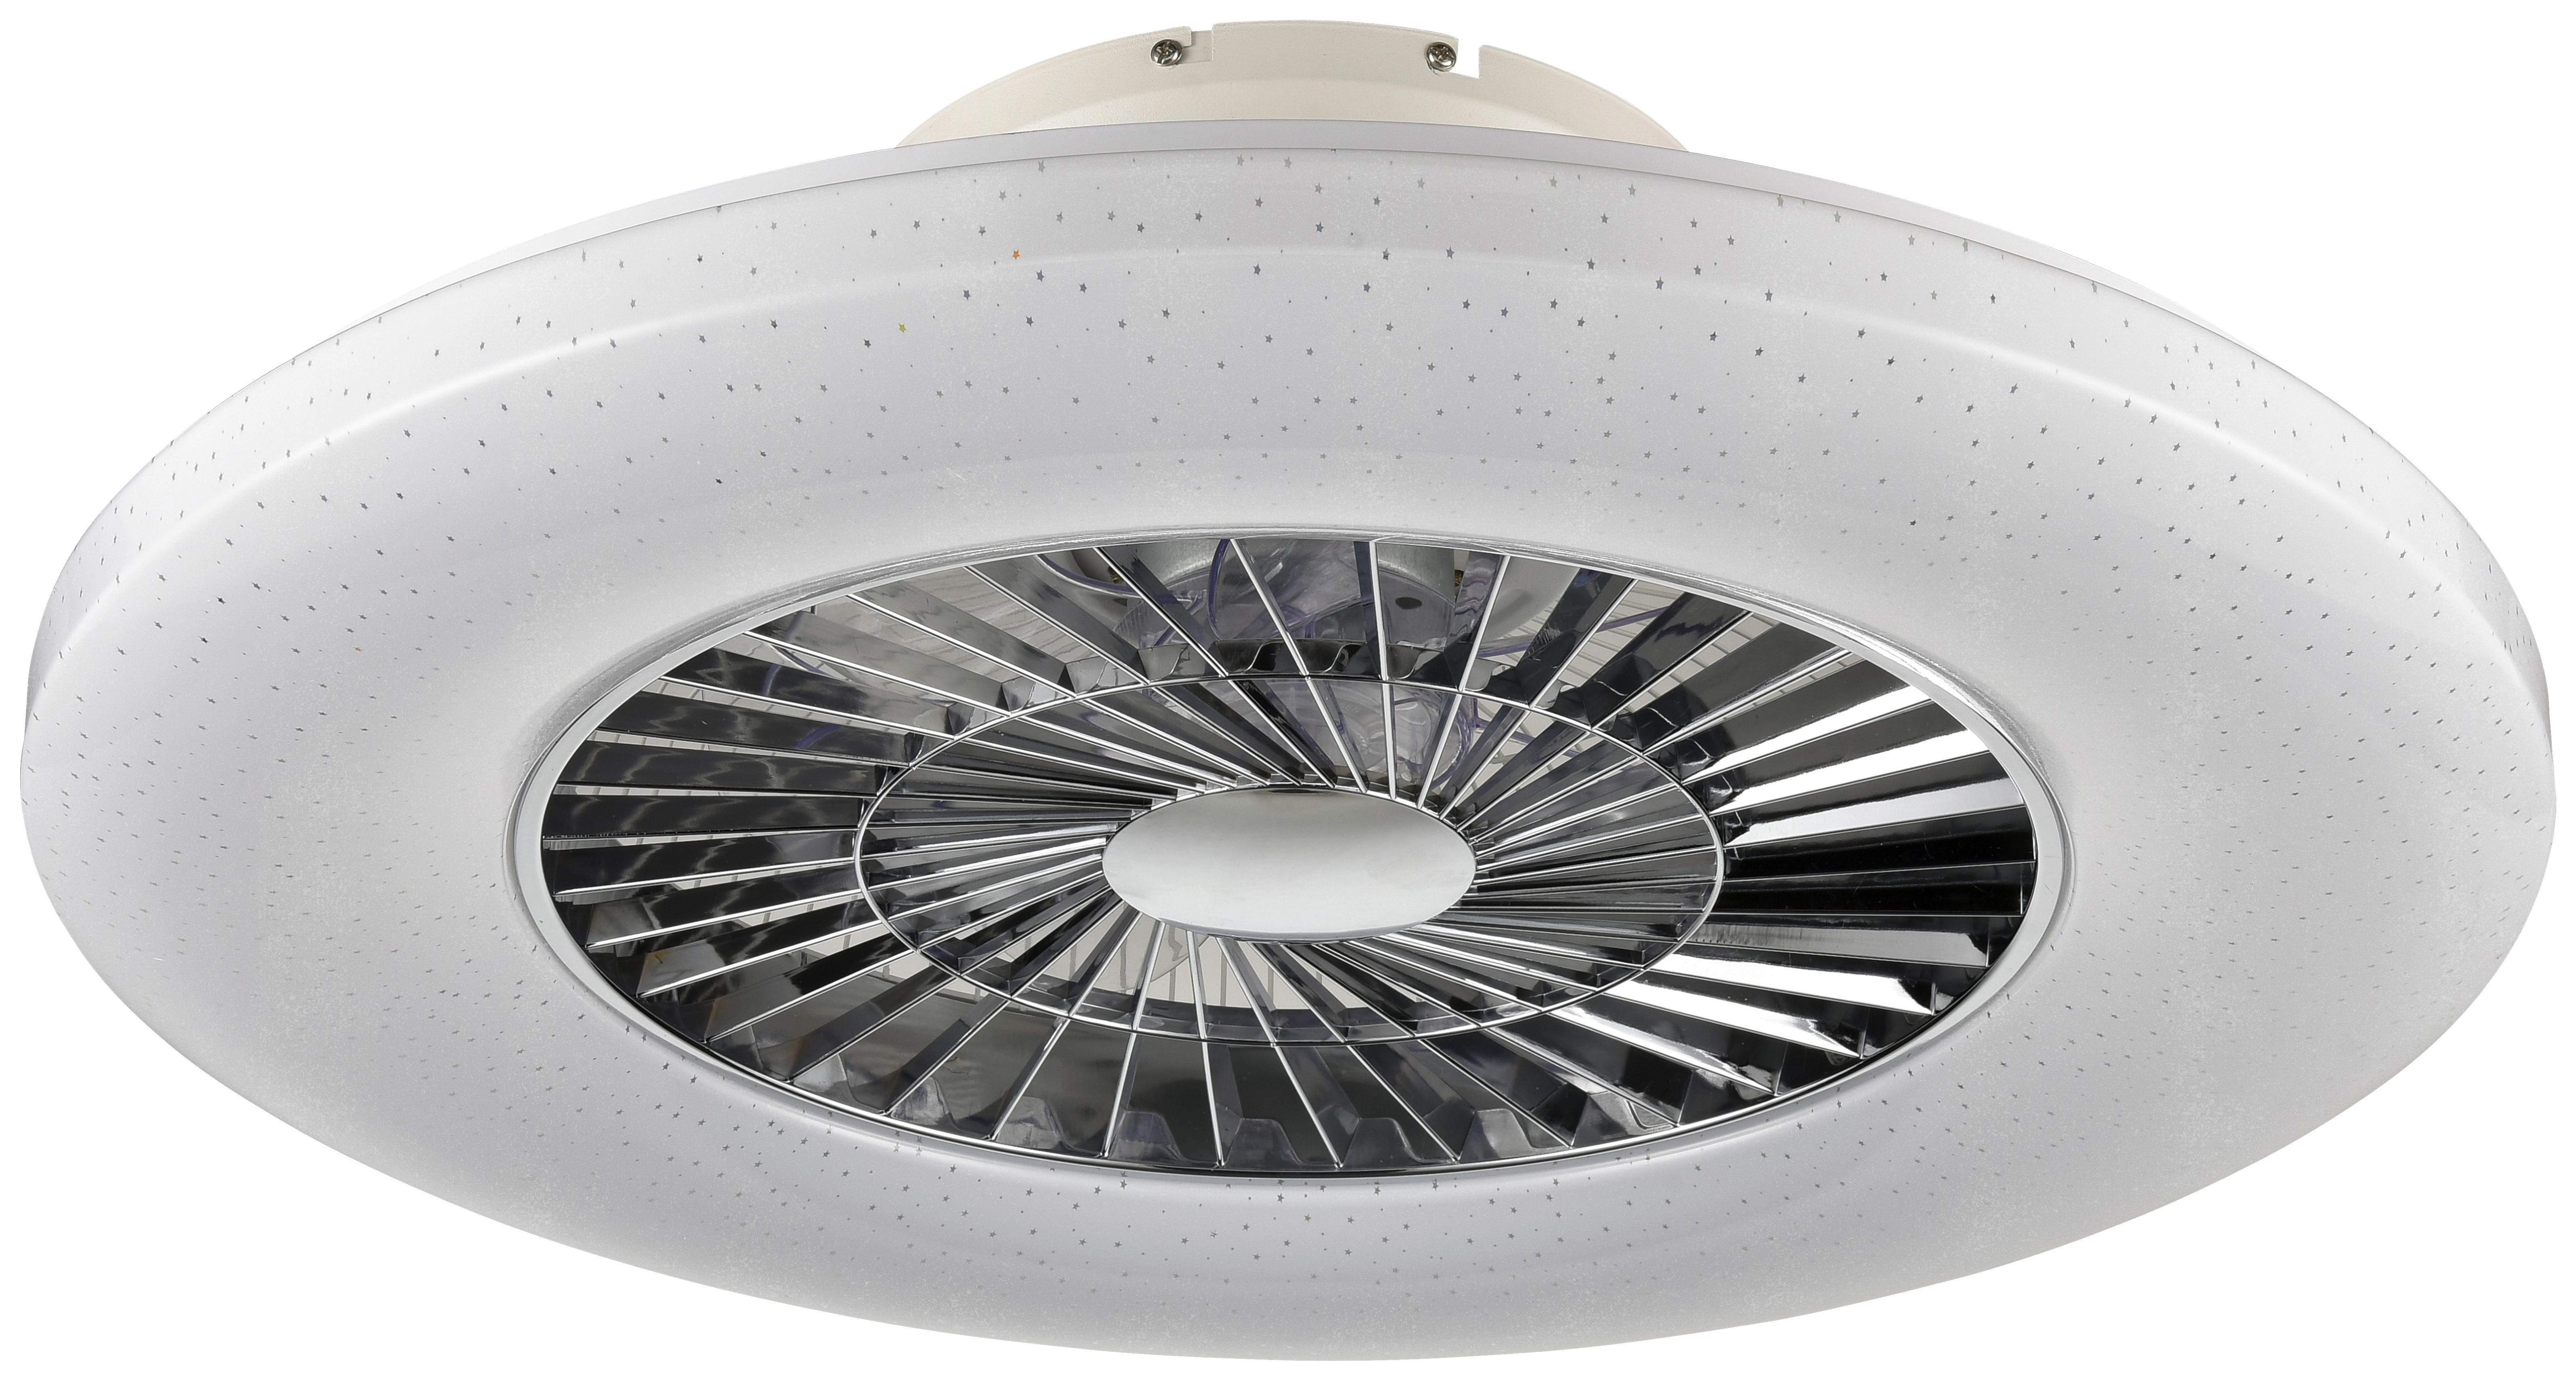 Deckenventilator Luftiku max. 40 Watt